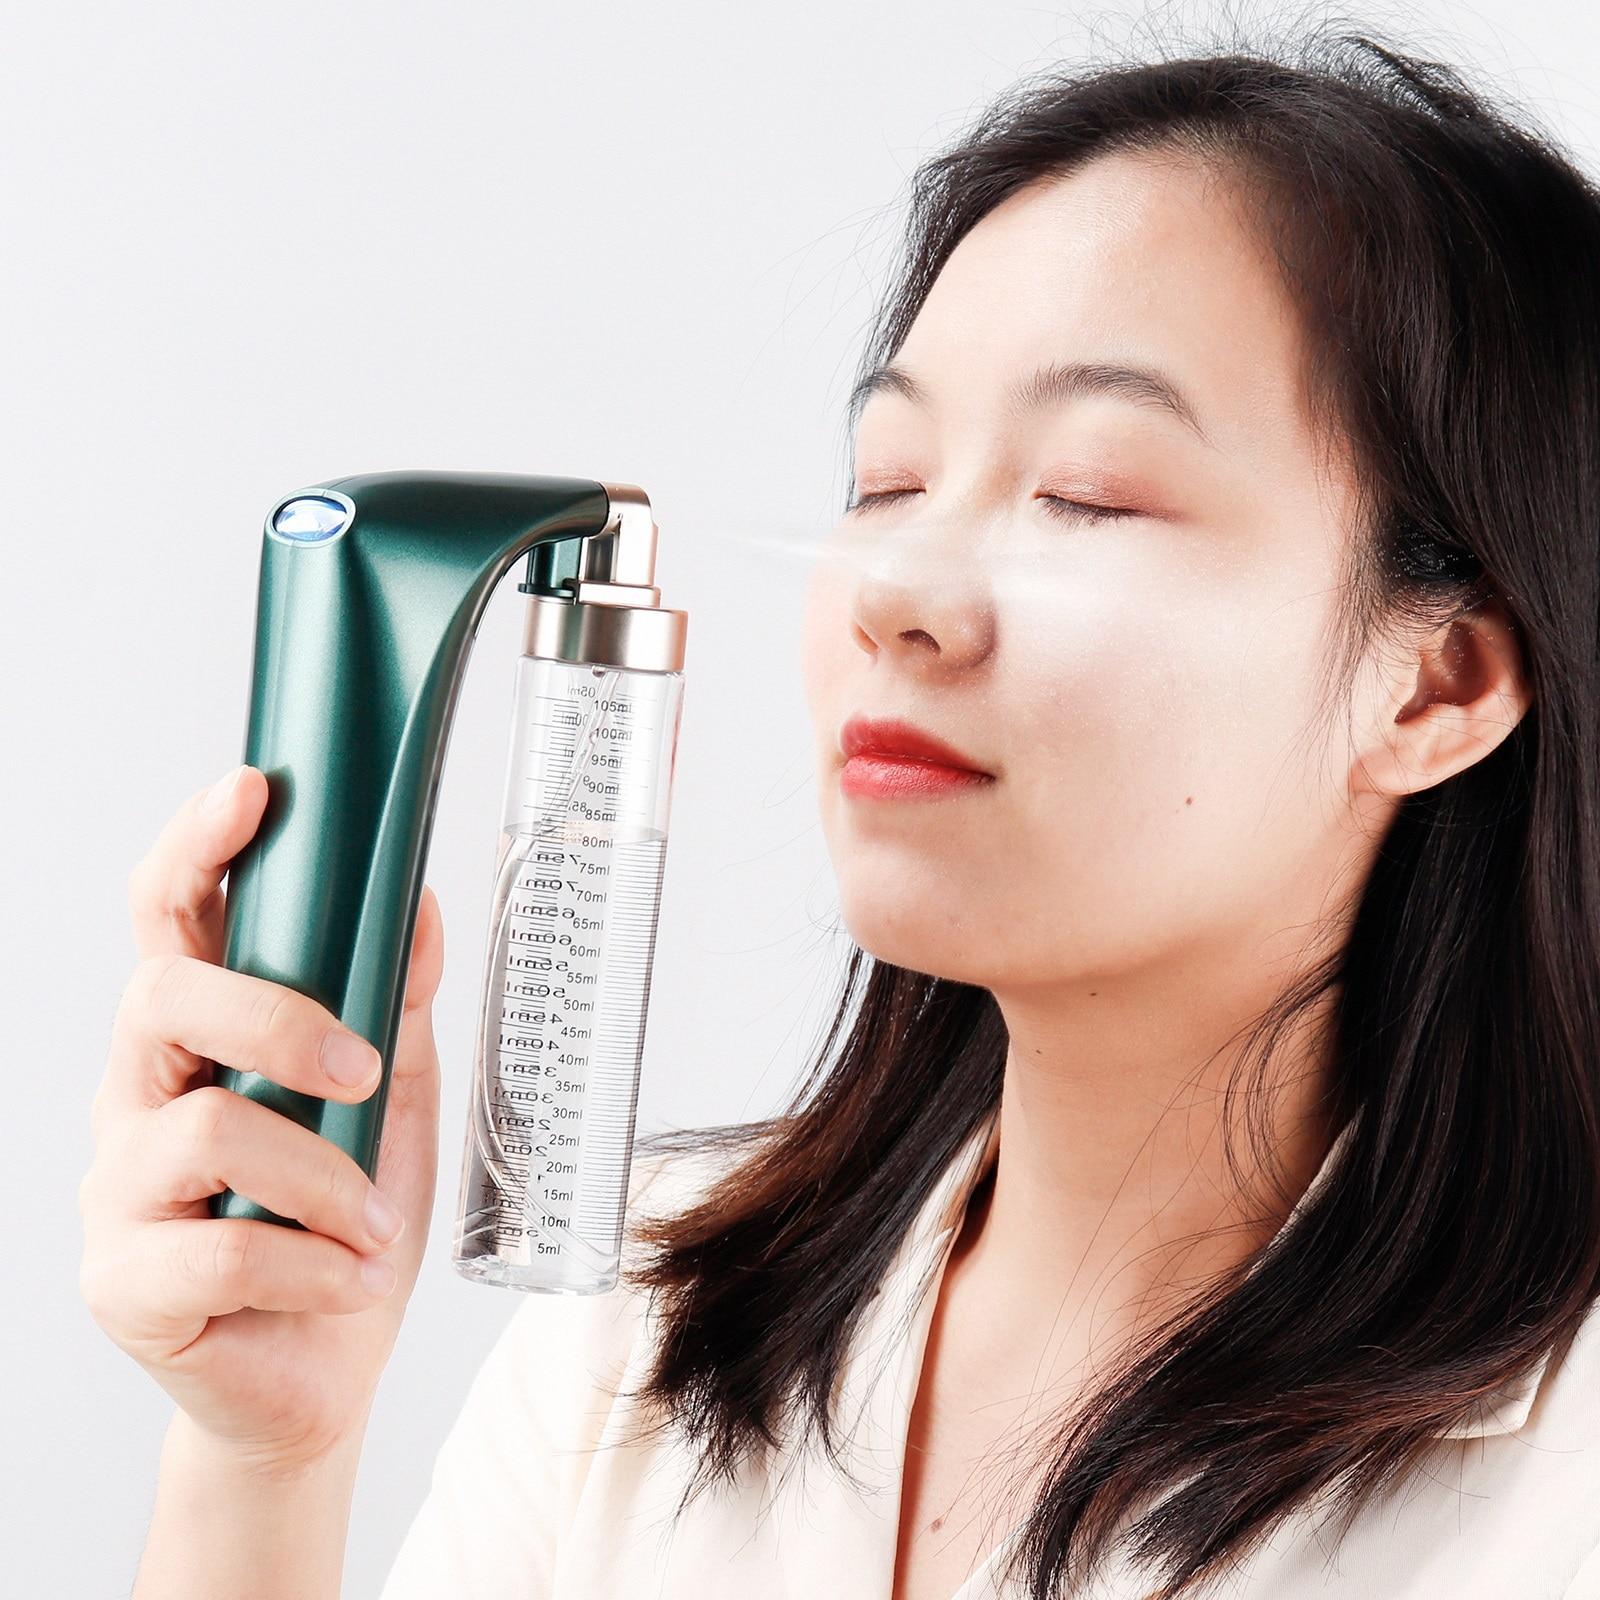 100ML Airbrush Nano Fog Mist Sprayer Skin Moisturizeing Sprayer Air Compressor Spray Gun Make Up Mask Facial SPA Moisturize Skin